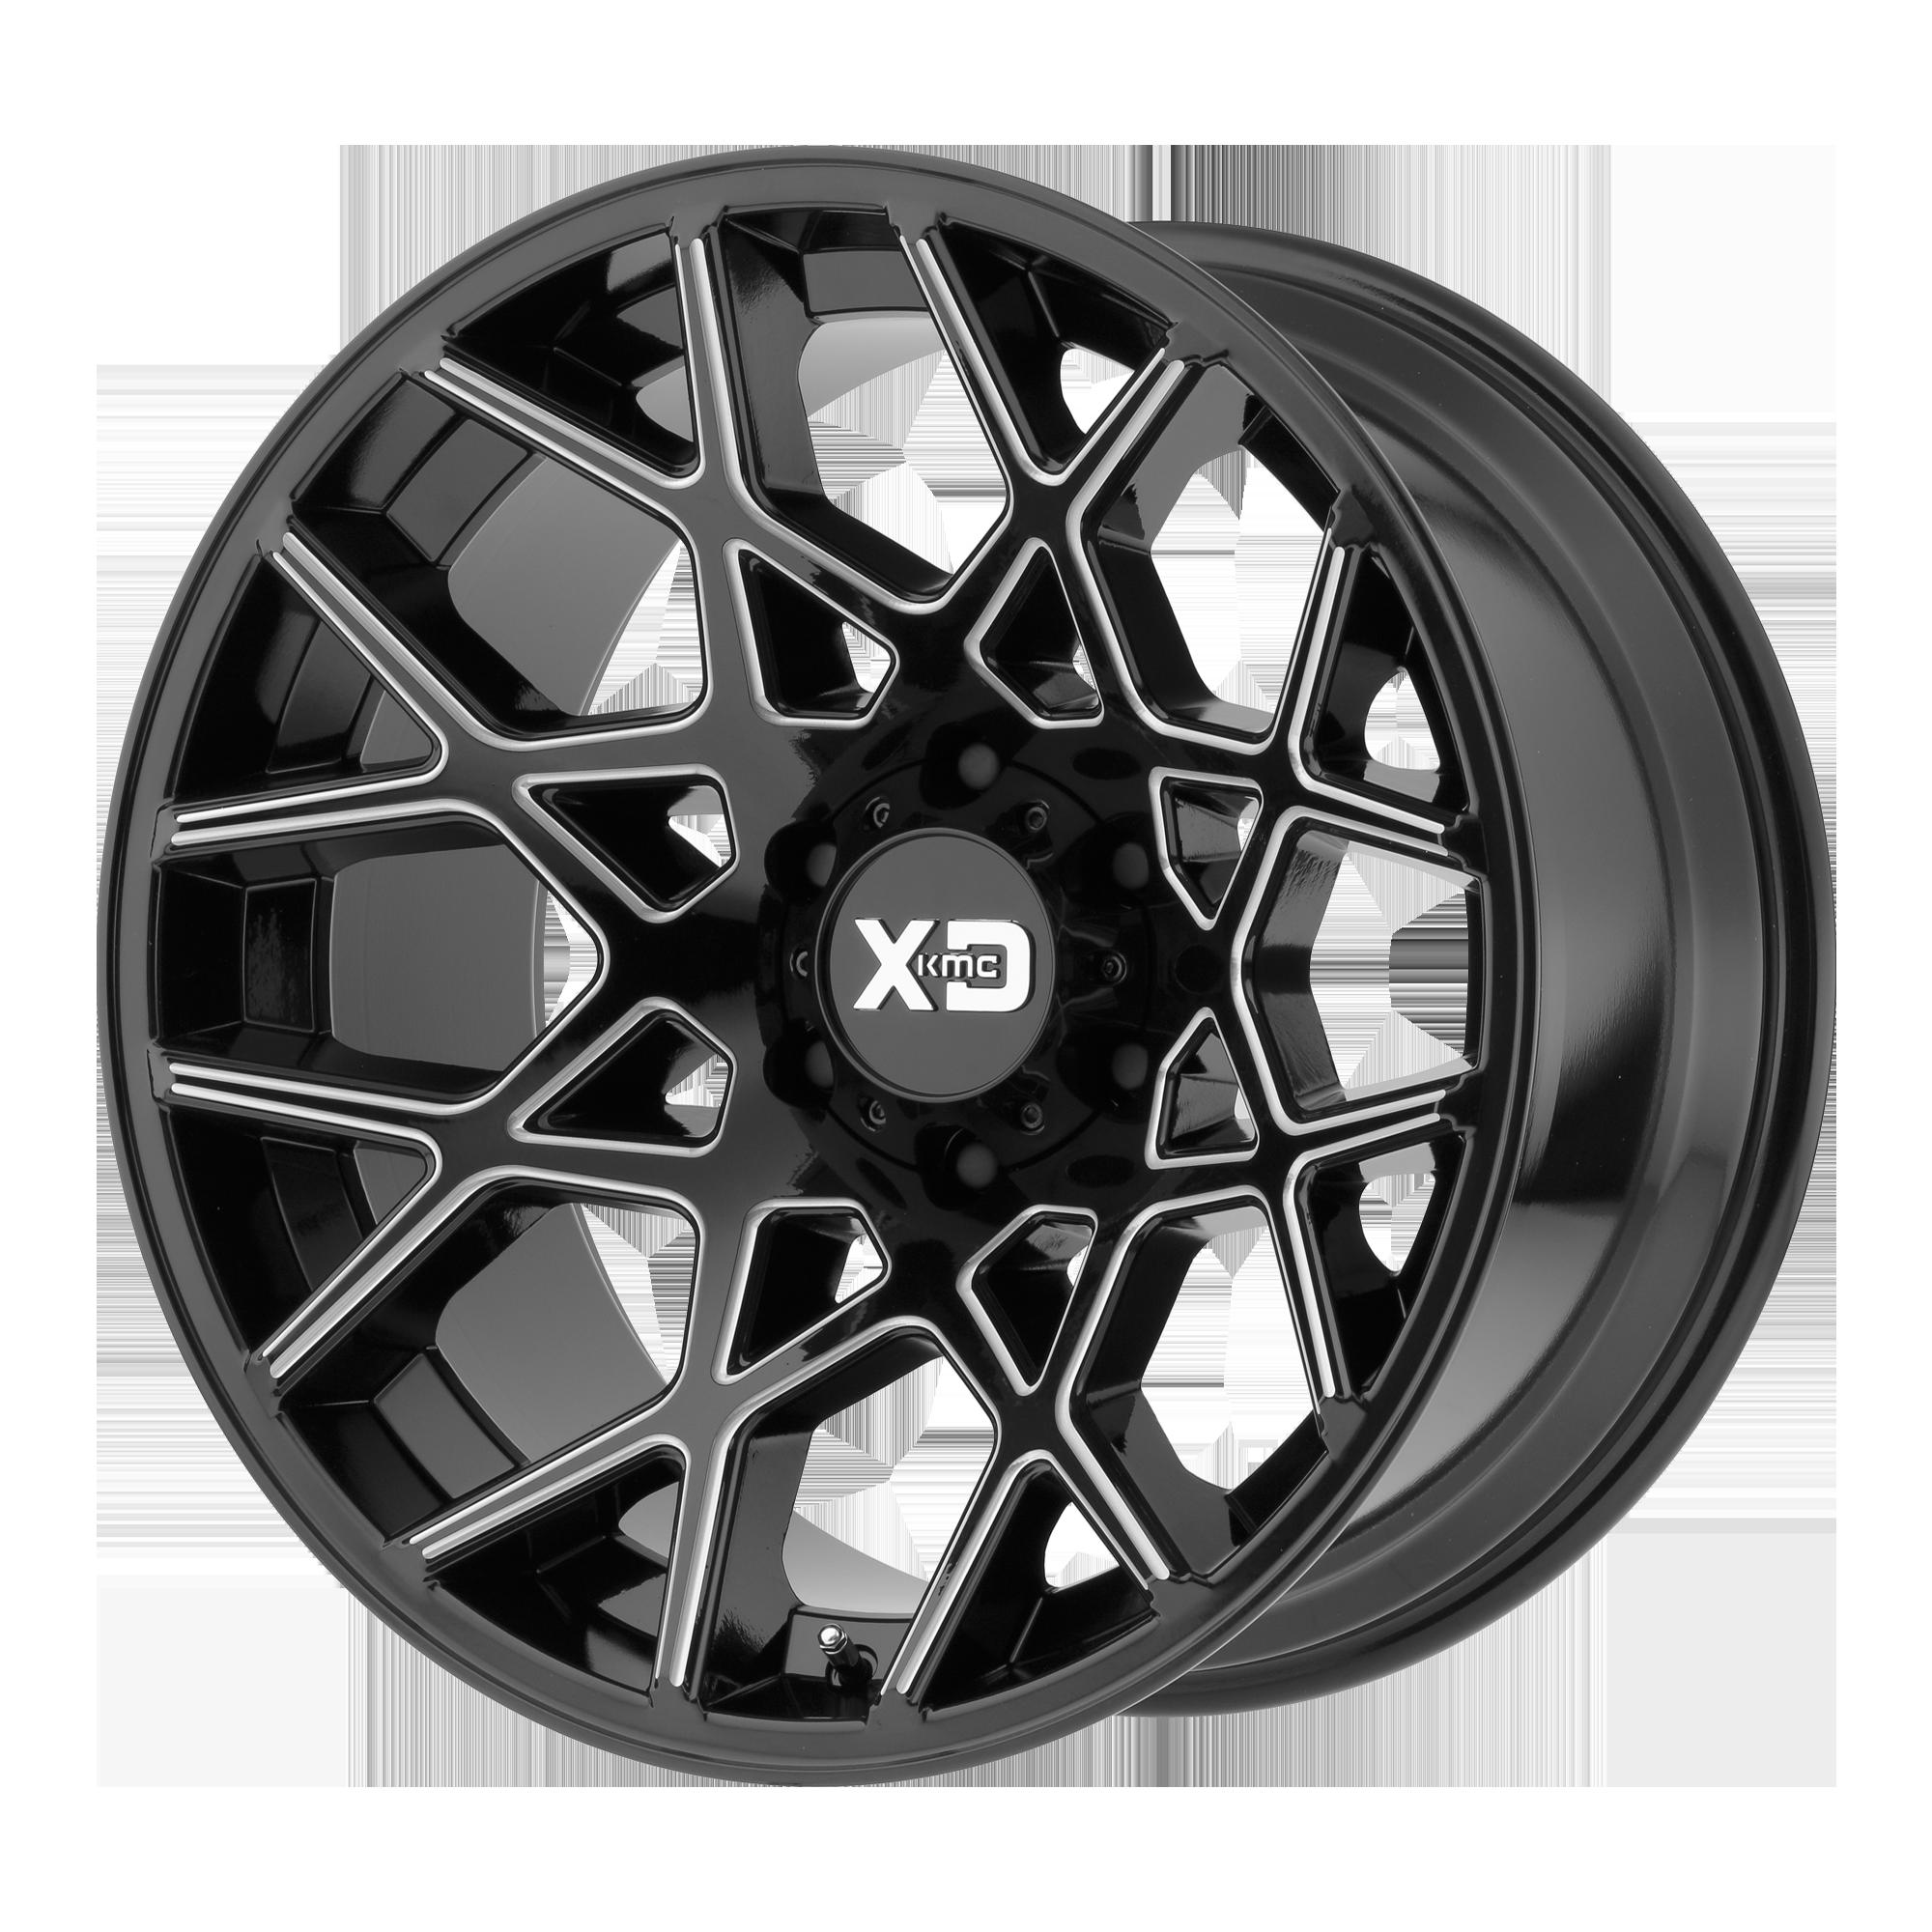 XD SERIES XD831 CHOPSTIX hliníkové disky 12x20 8x165,1 ET-44 Gloss Black Milled